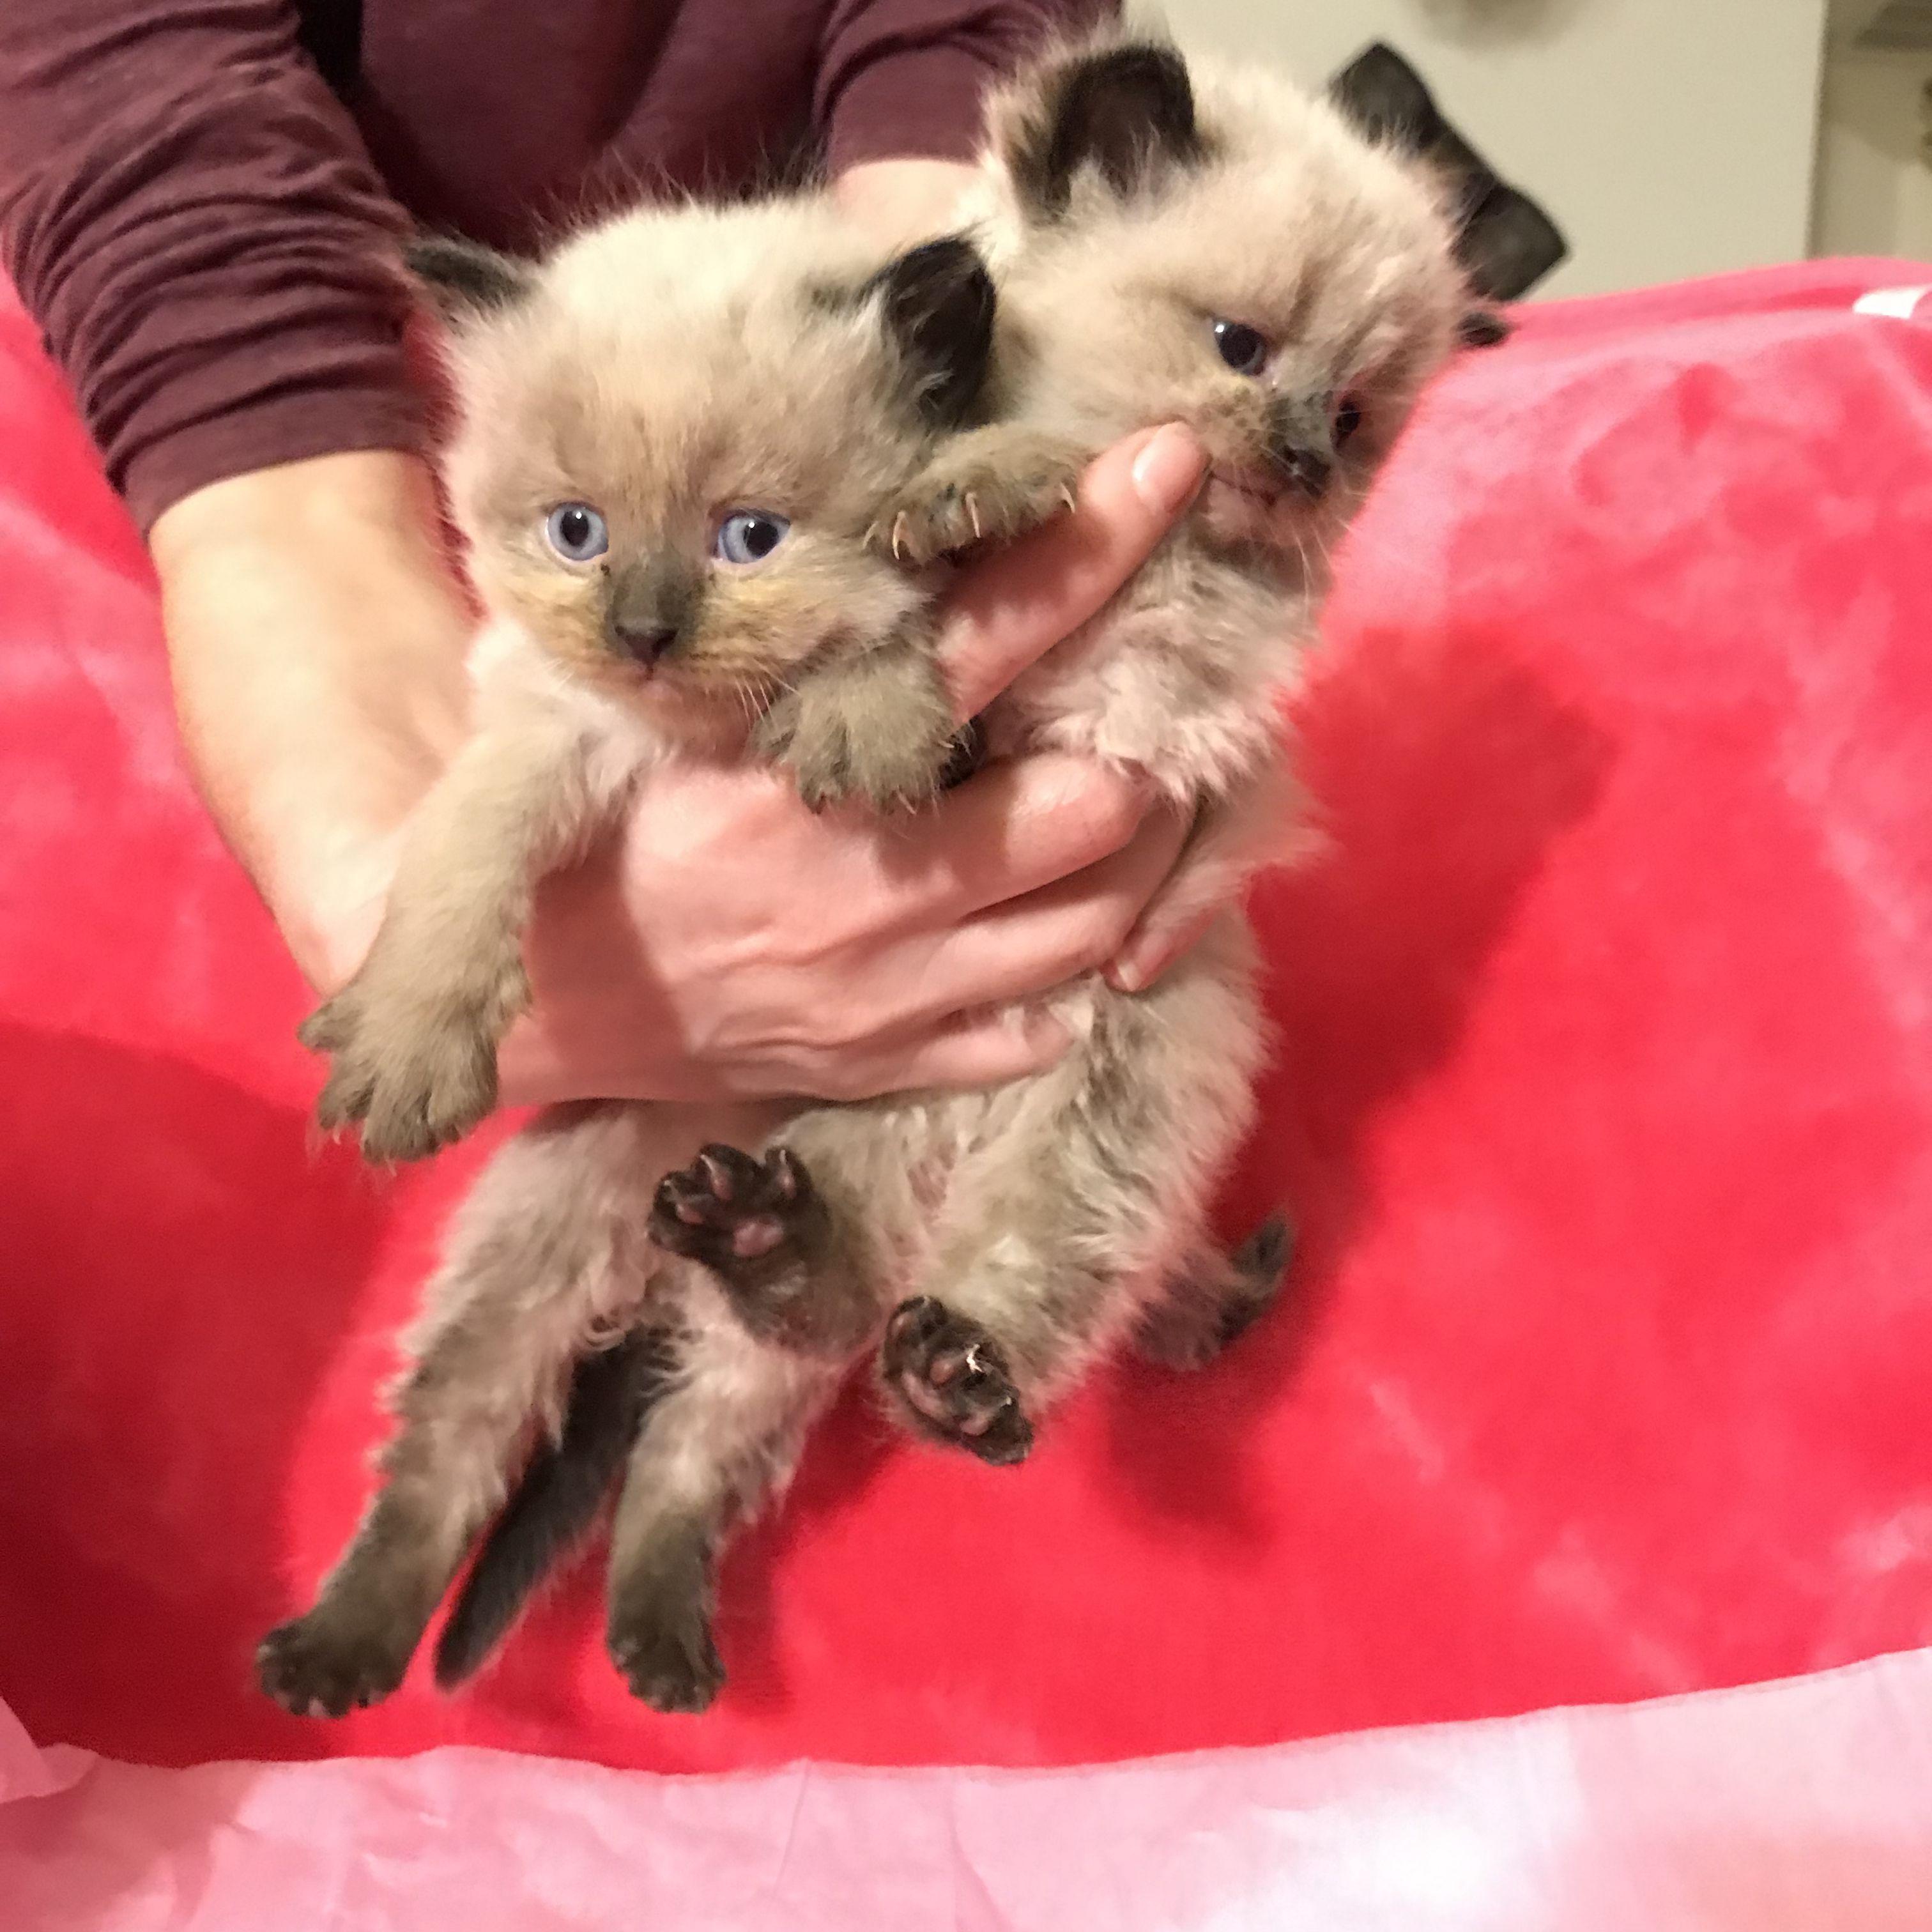 Pin By Ennovi On Purralot Kittens Austin Tx Fur Babies Kittens Animals